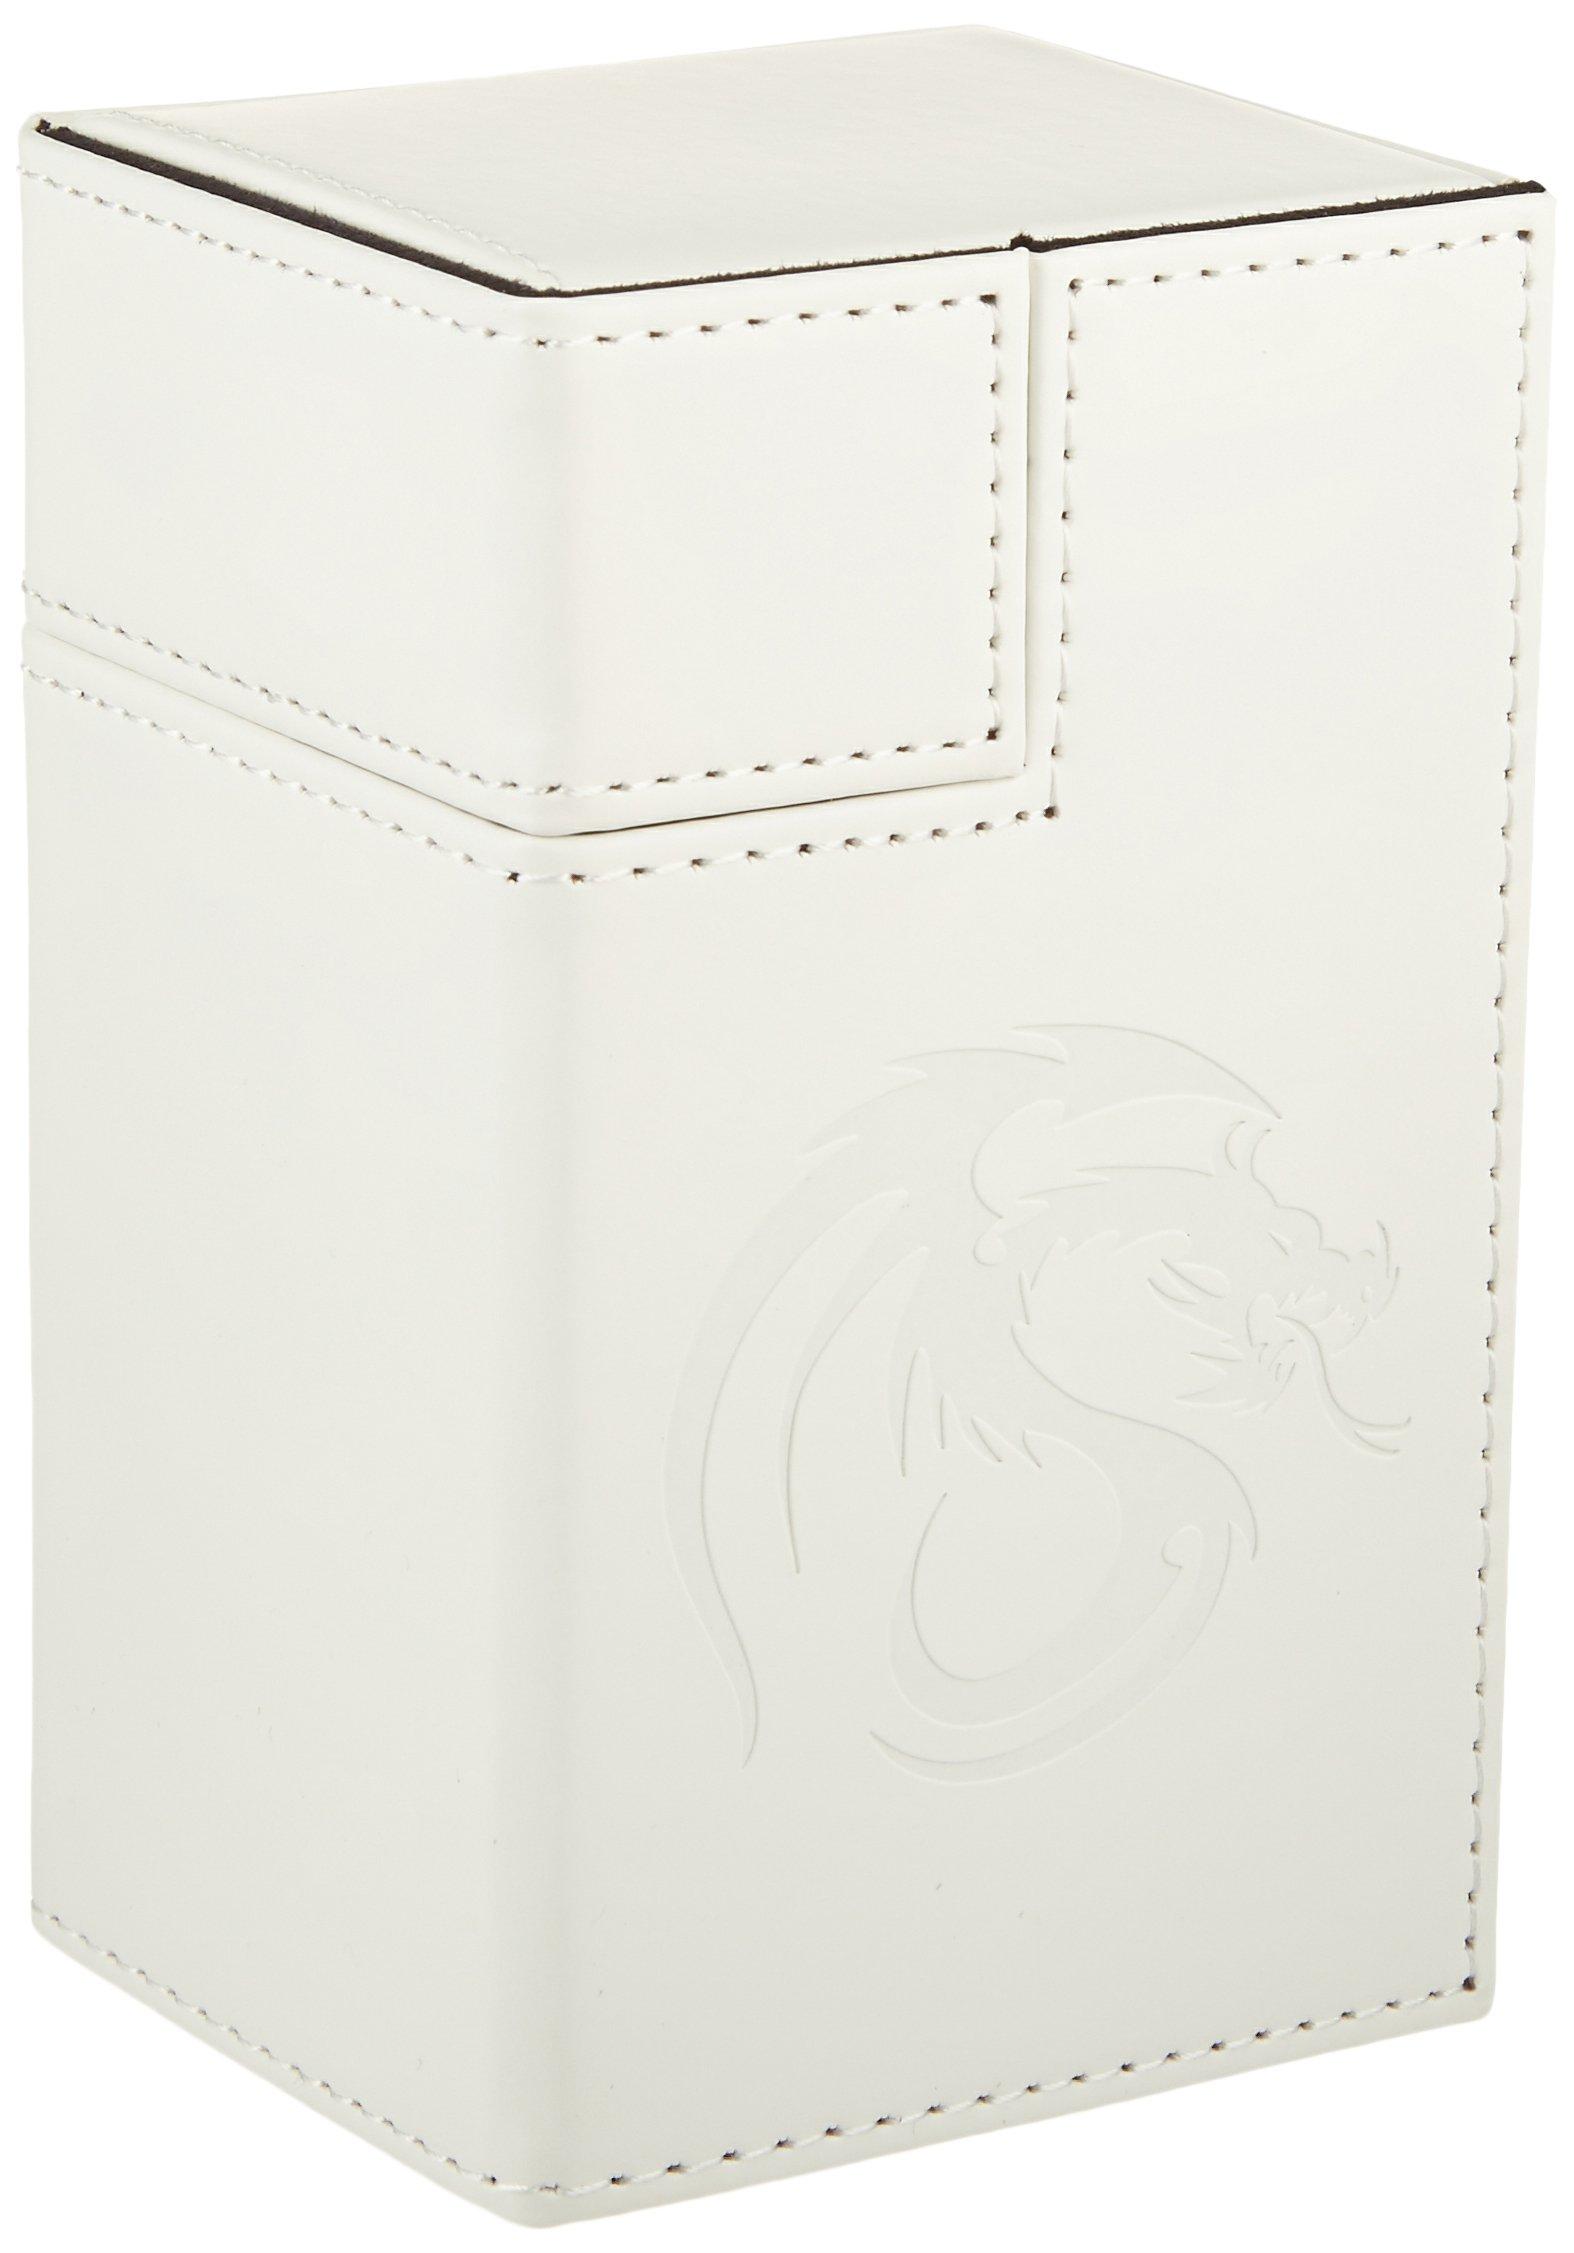 BCW 1-DCLK-LX-WHI Gaming Deck Locker, LX White by BCW